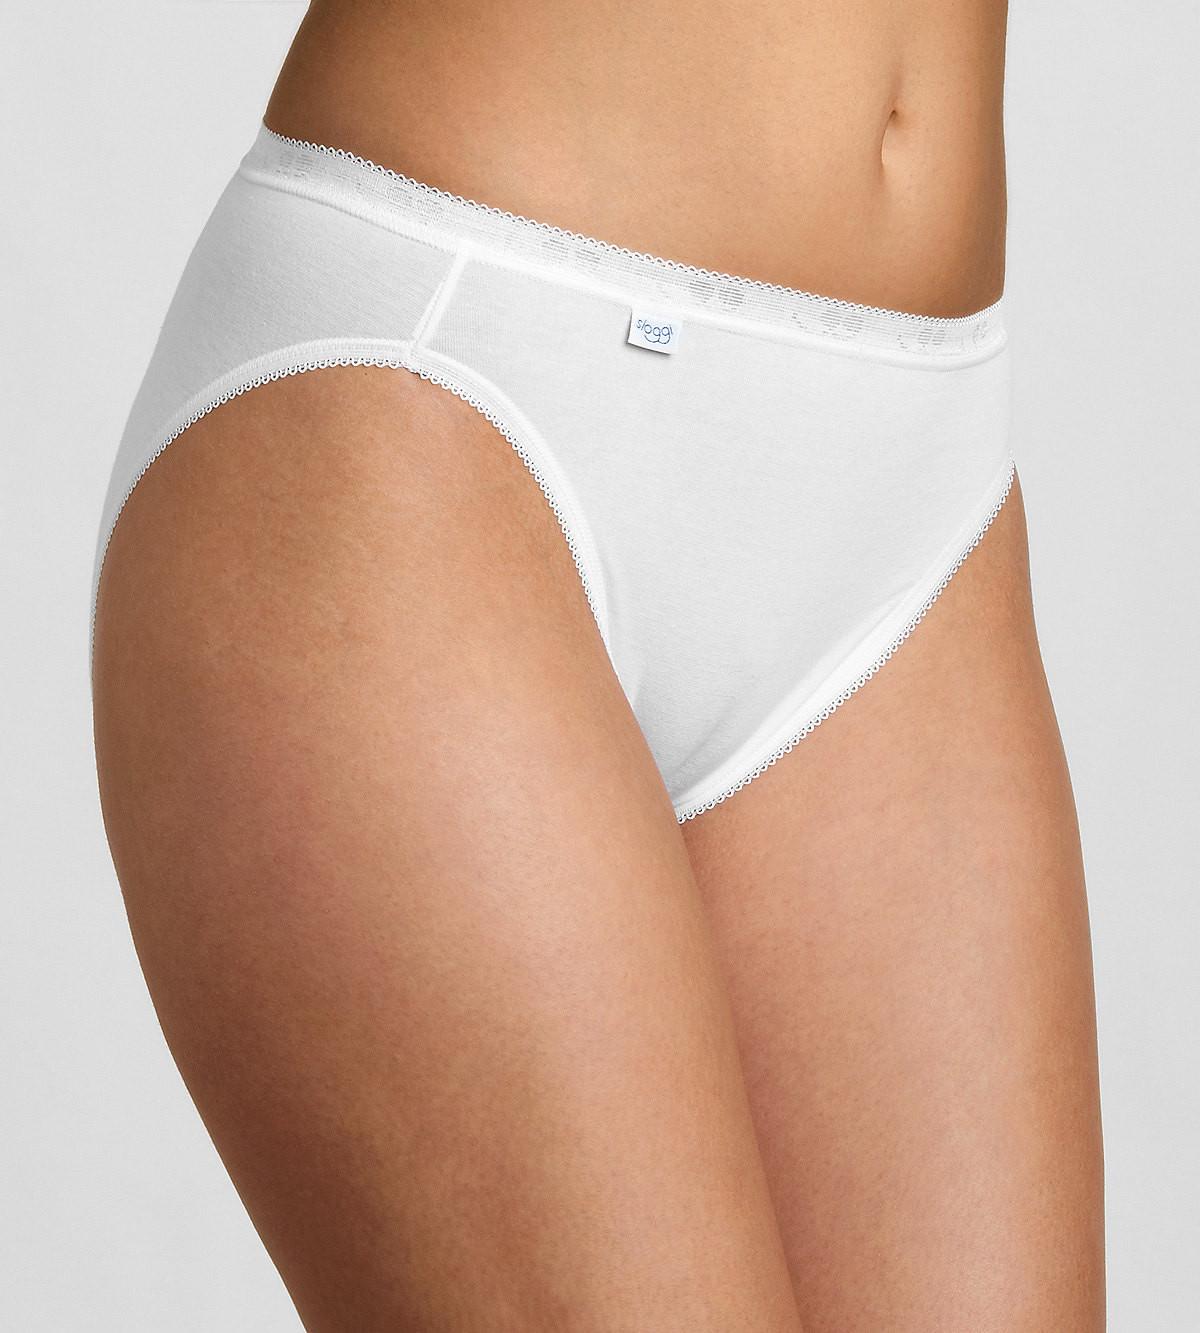 Kalhotky Sloggi Basic+ Tai 2P bílá 0003 - Triumph Barva: bílá, Velikost: 40